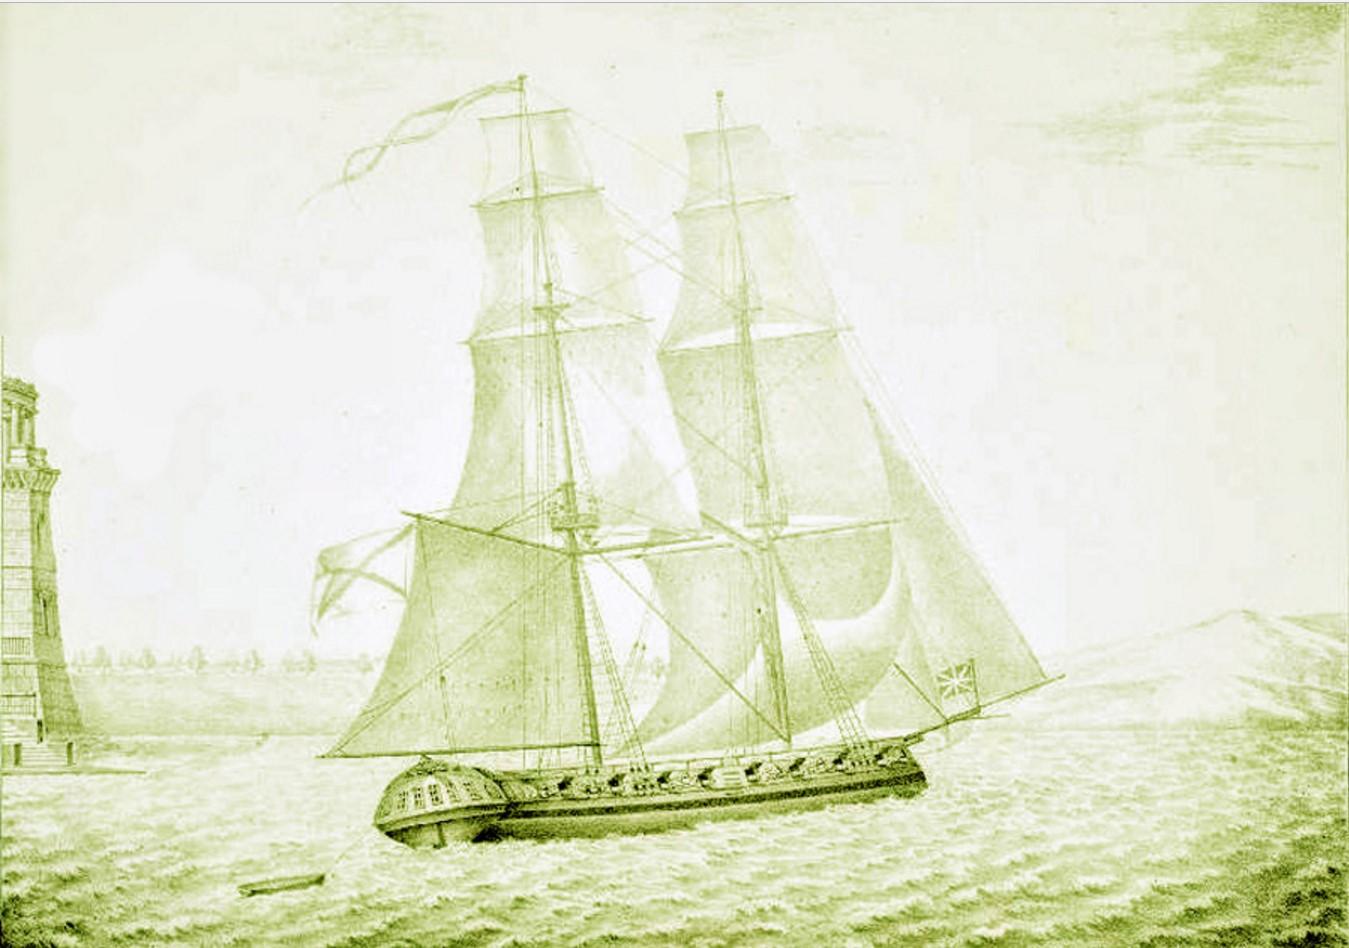 Вид Яхты в селе Грузине на реке Волхове. Рисовал на камне П. Колмаков. 1822